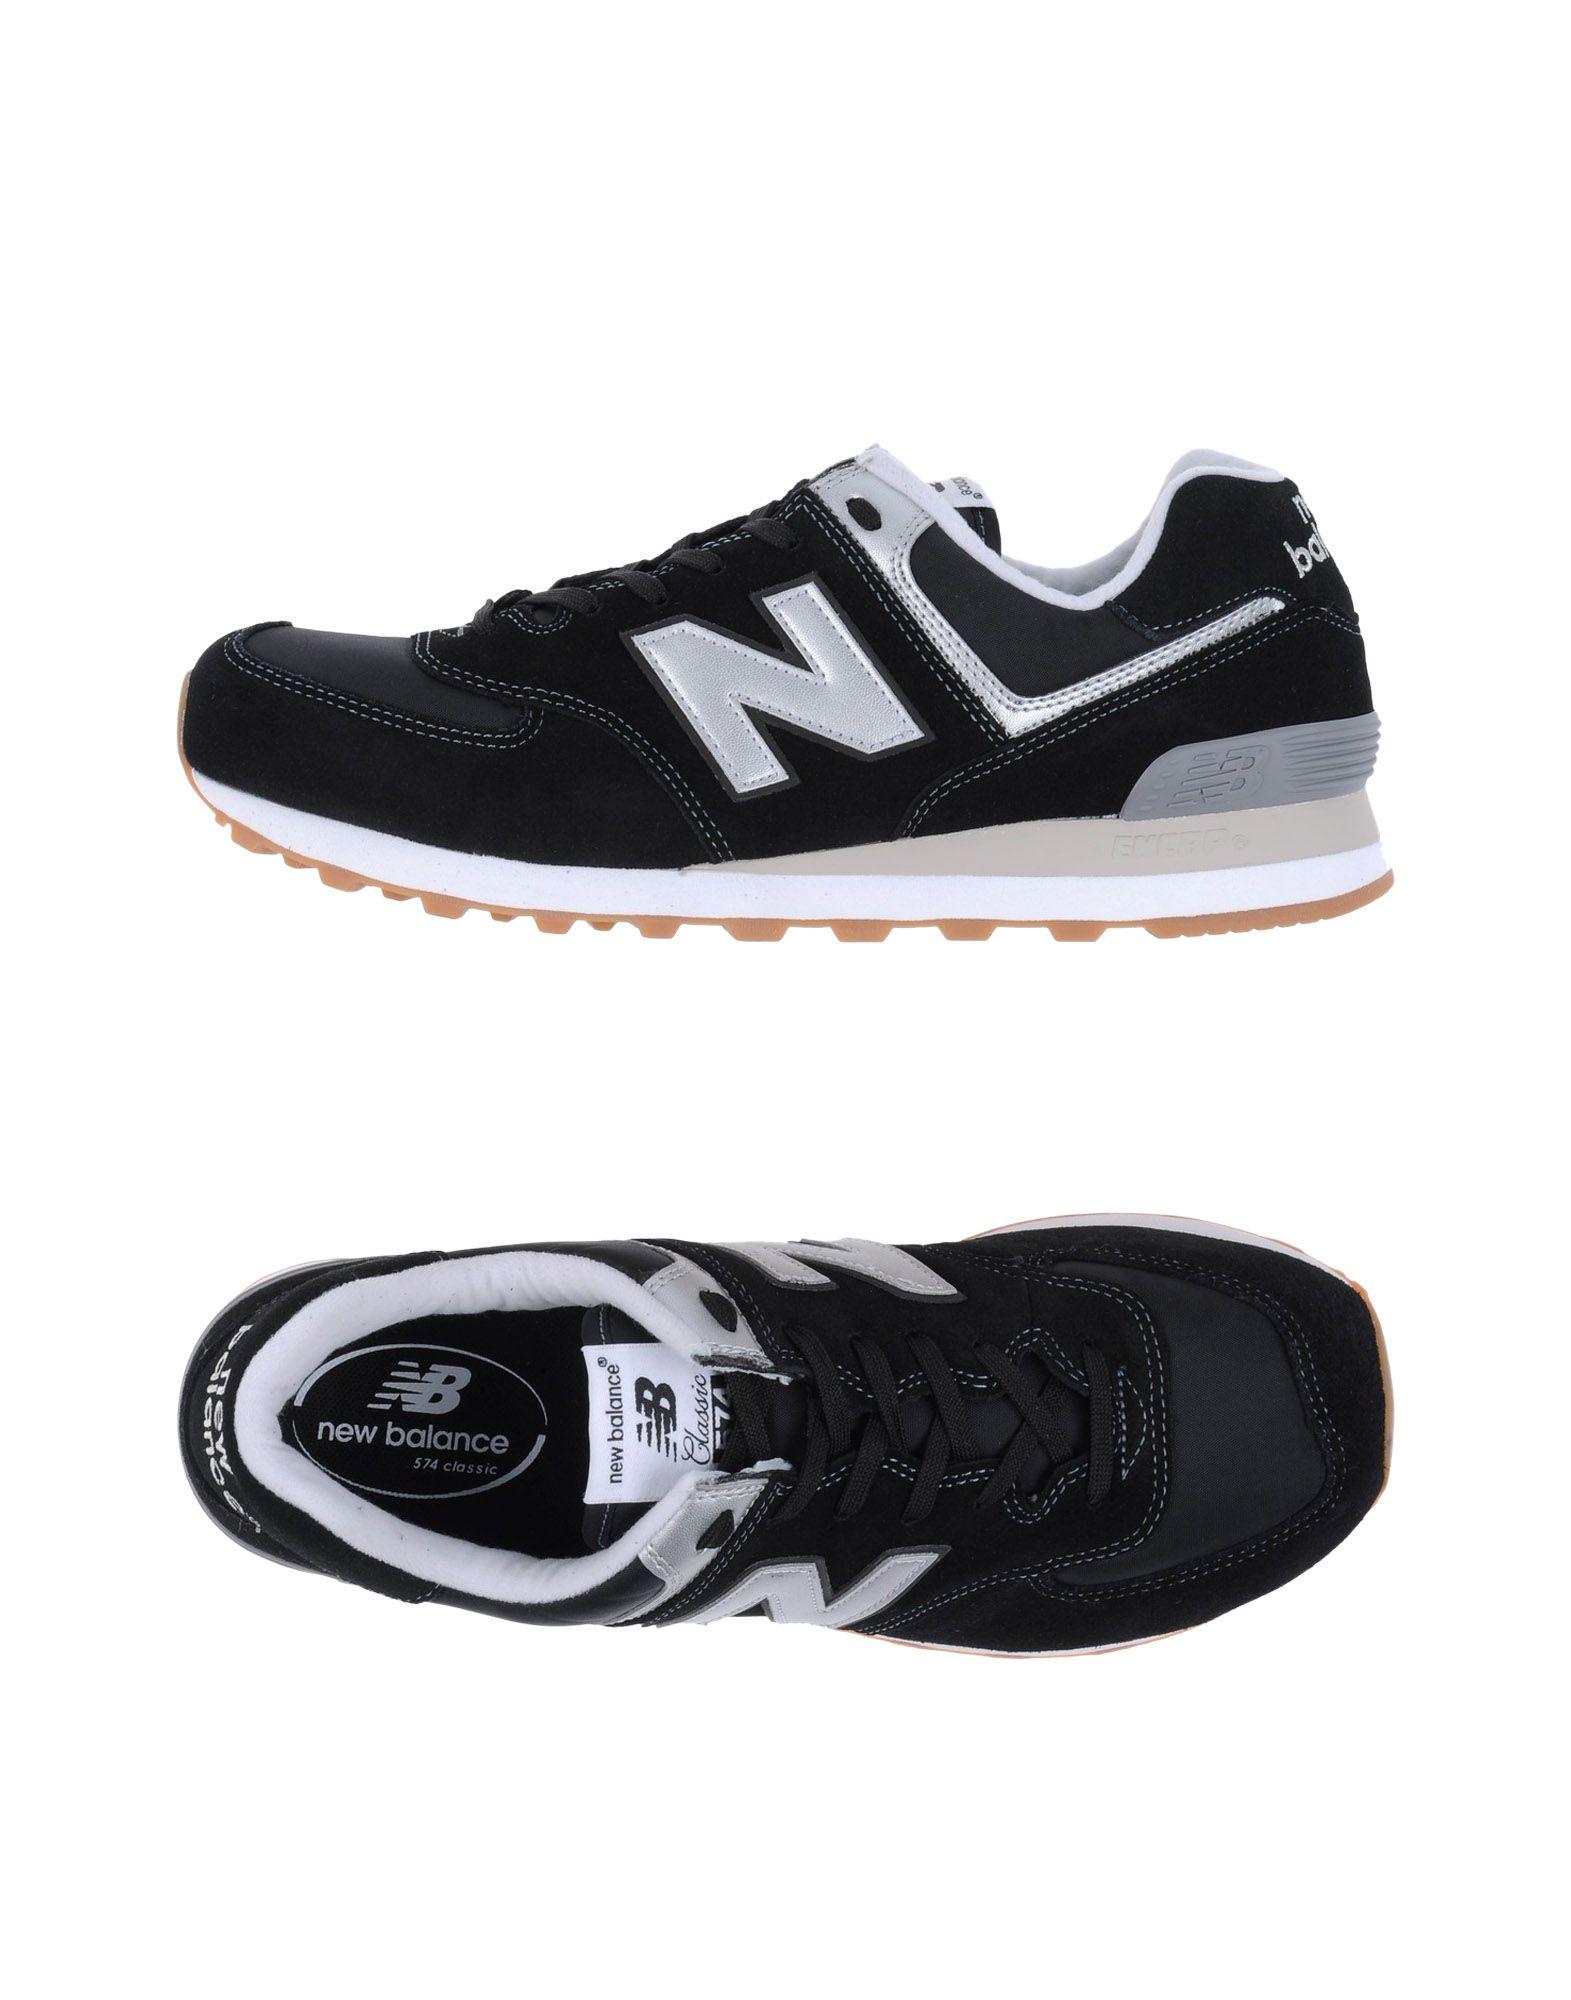 Sneakers New Balance 574 Suede - Nylon Bright - Uomo - 11195562HA